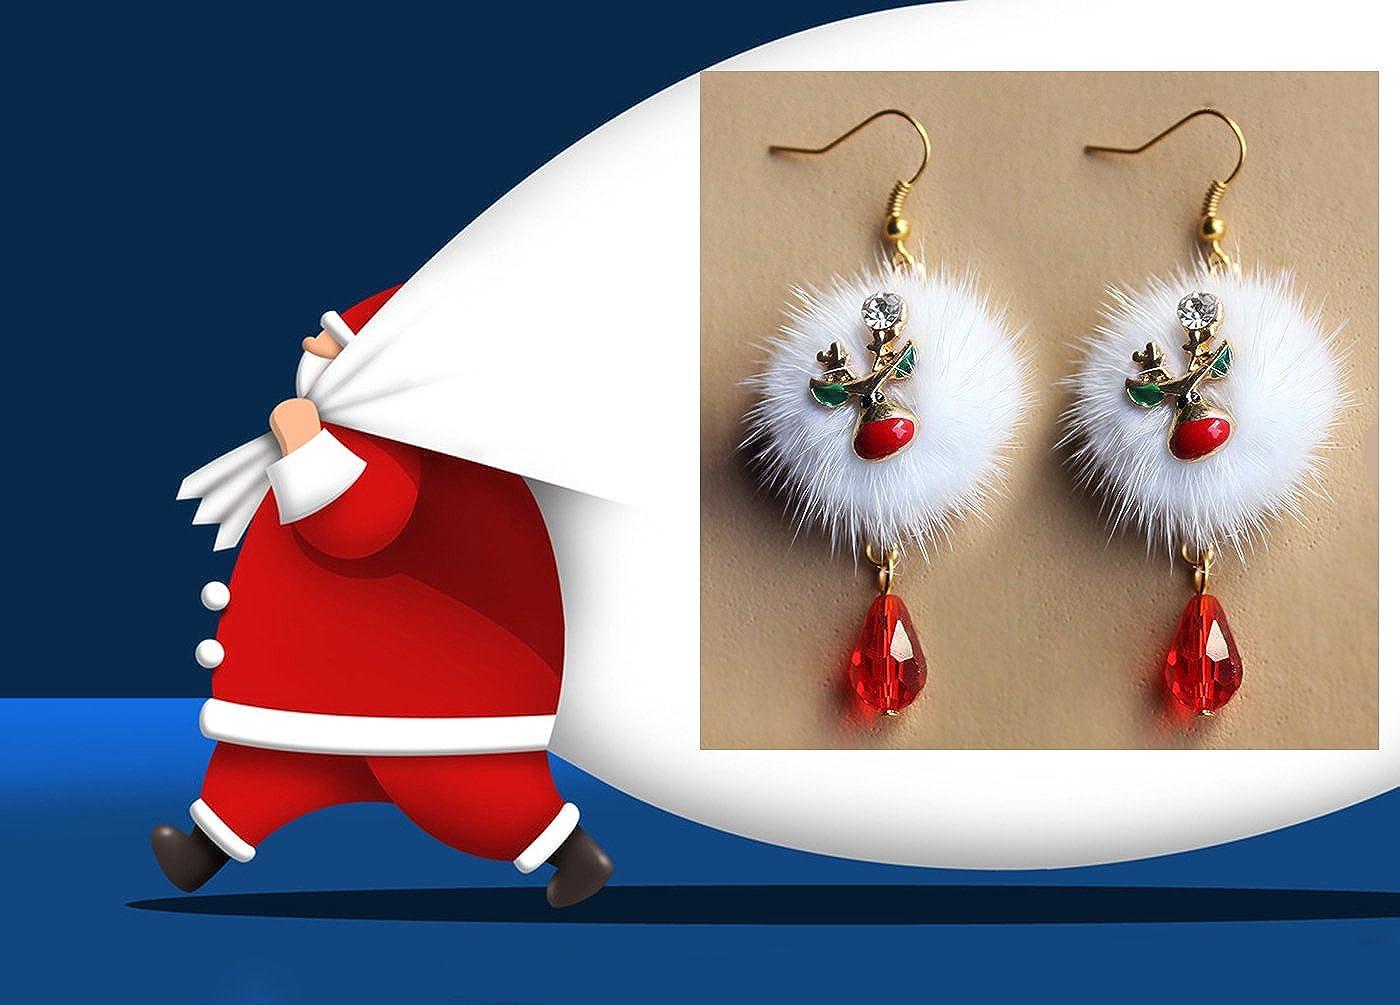 Youniker 2 Pairs Christmas Earrings Set Gift Hypoallergenic Christmas Jewelry for Women Christmas Drop Dangle Earrings Jewelry Sets for Girls Kids Teens Plush Santa Claus Enamel Deer